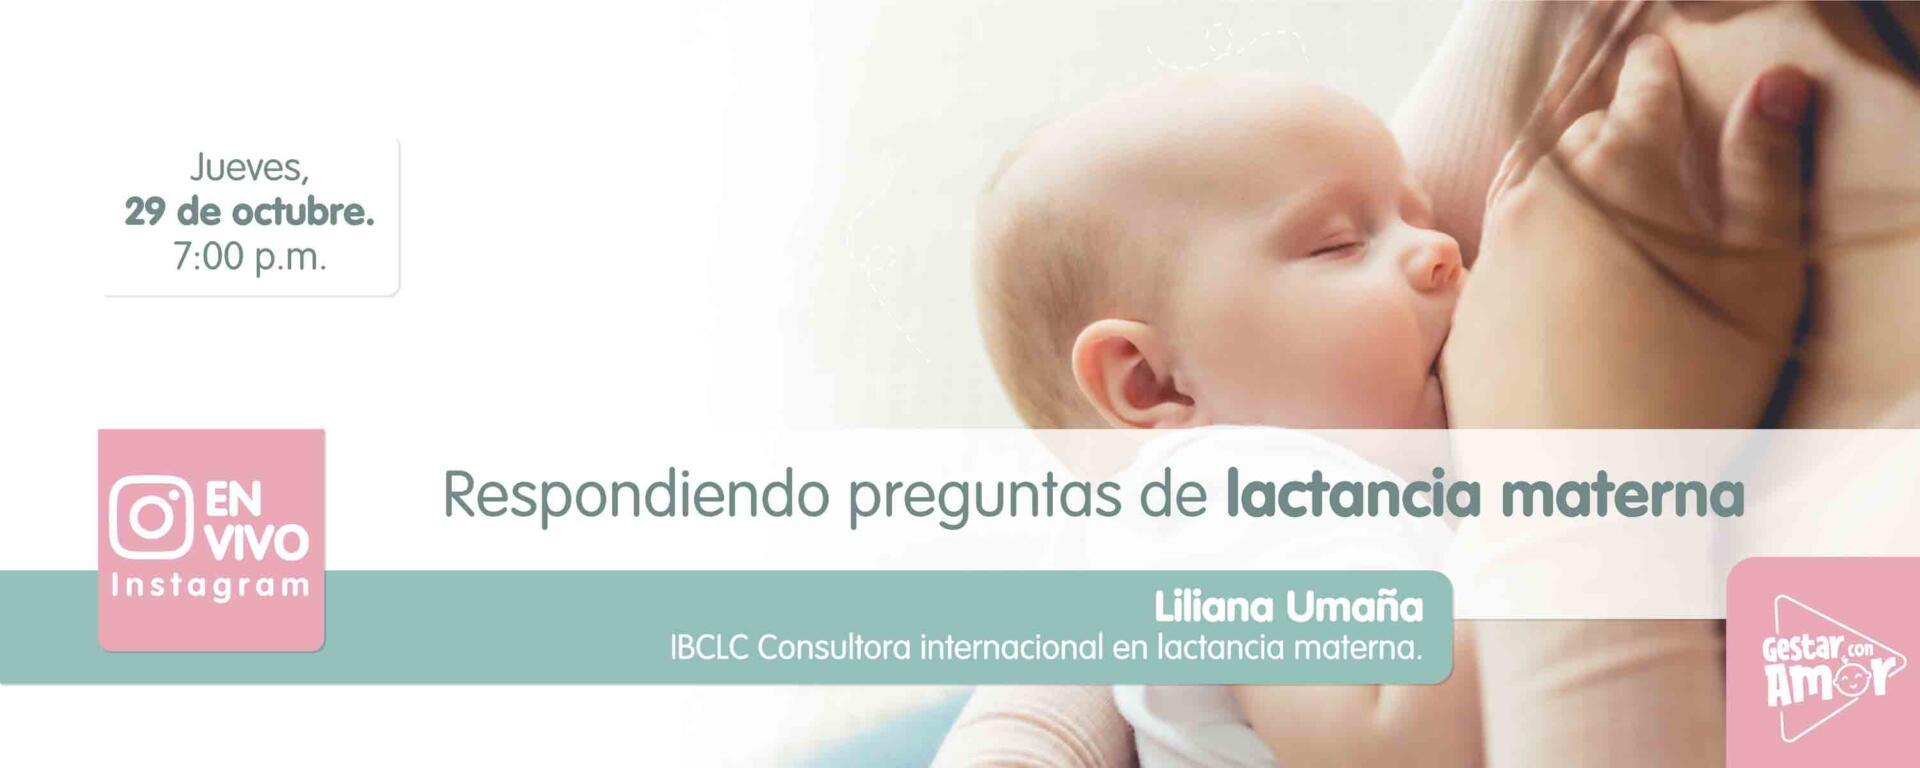 Instagram live: Respondiendo preguntas de lactancia materna